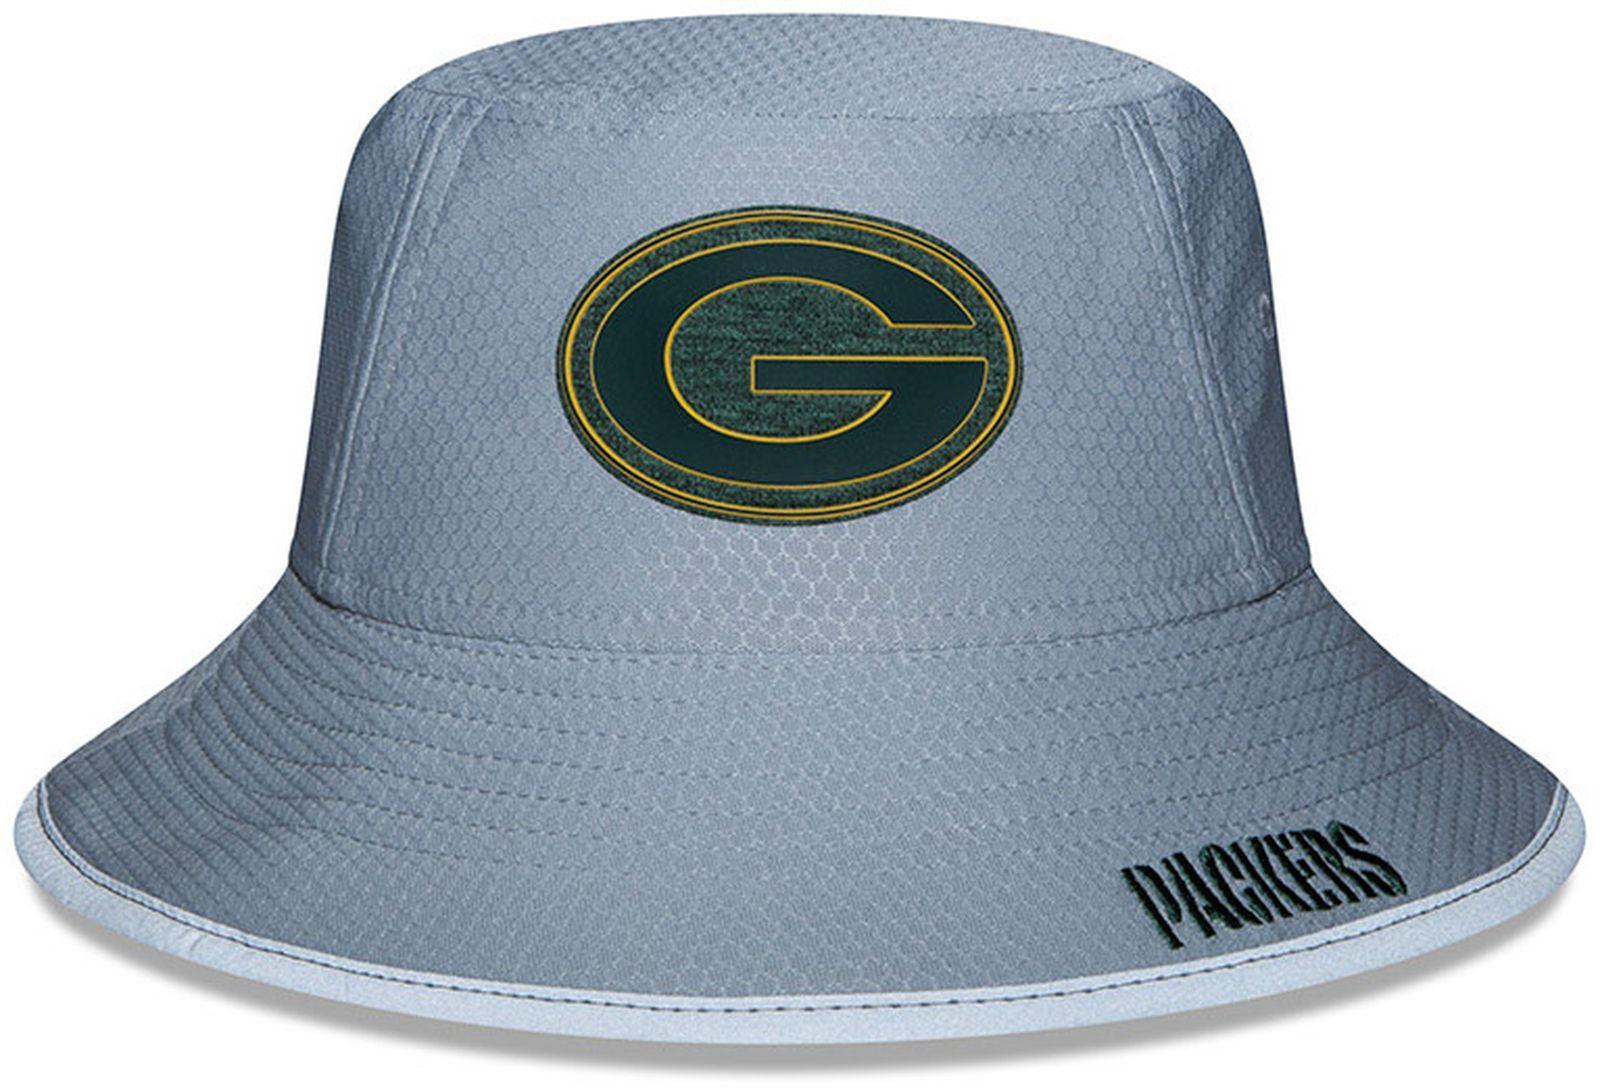 ... Vorschau  New Era - NFL Green Bay Packers On Field 2018 Training Bucket  Hat Hut acd0e3dda12f